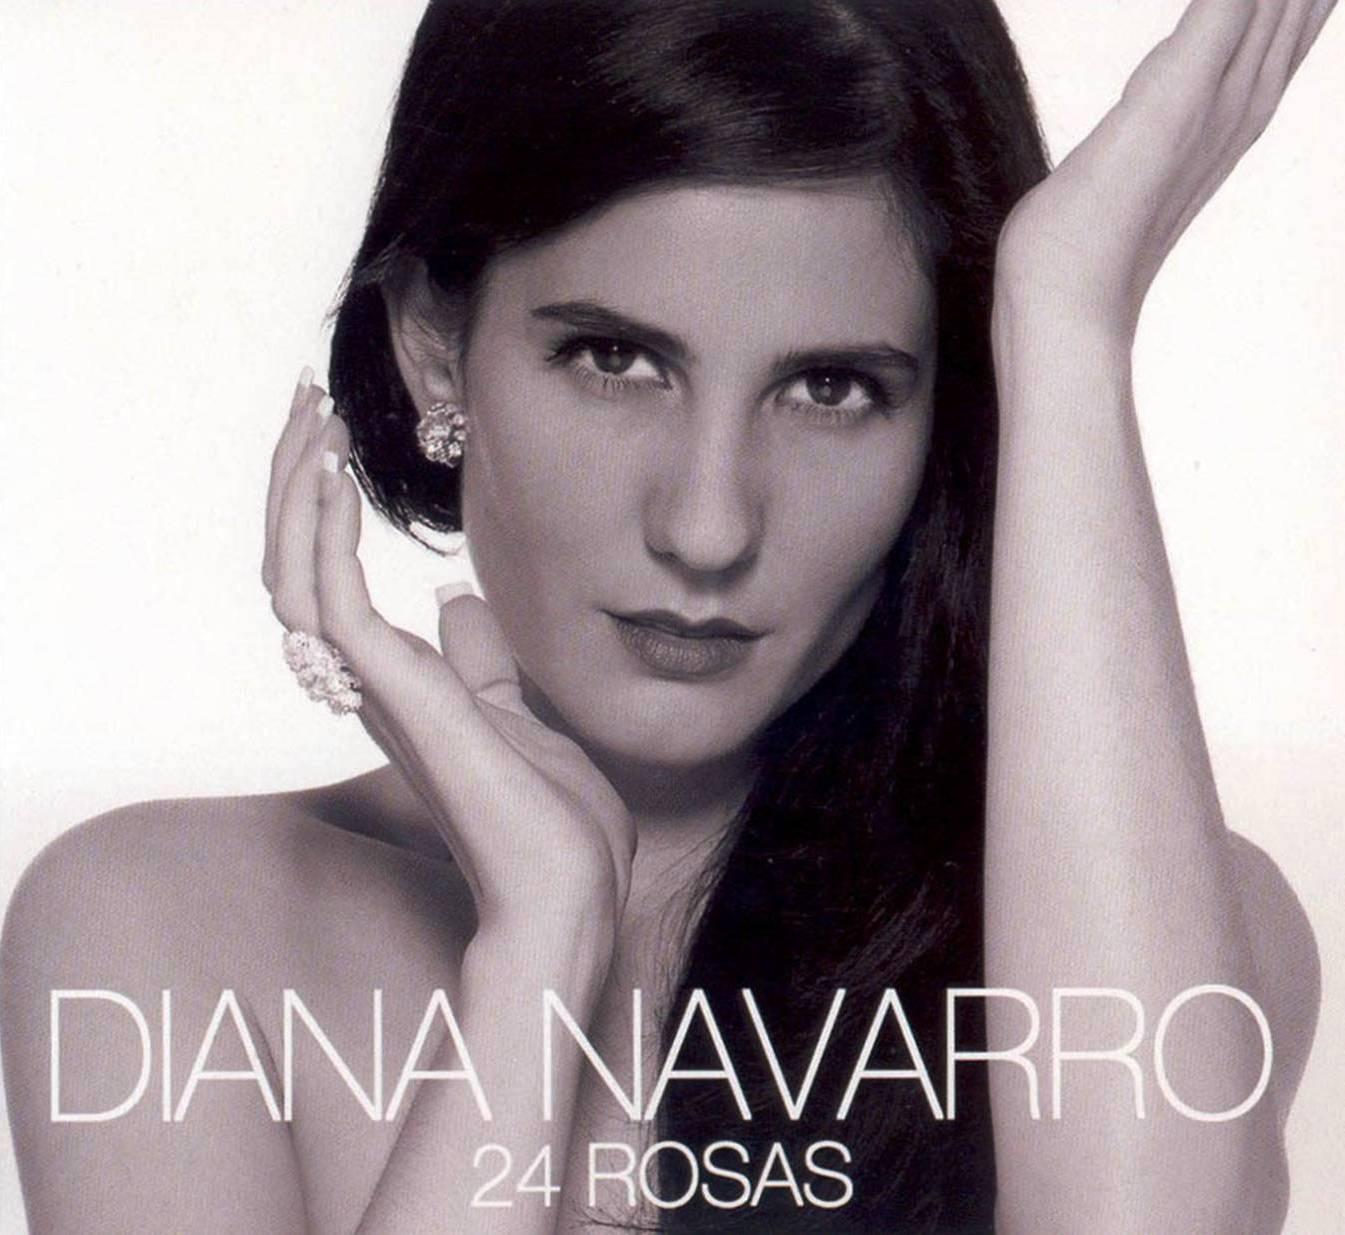 http://3.bp.blogspot.com/-FHC29w8ZnBE/T8iFol6ovNI/AAAAAAAAA9s/9LKsIoL82W8/s1600/Diana+Navarro+24+rosas+2007.jpg